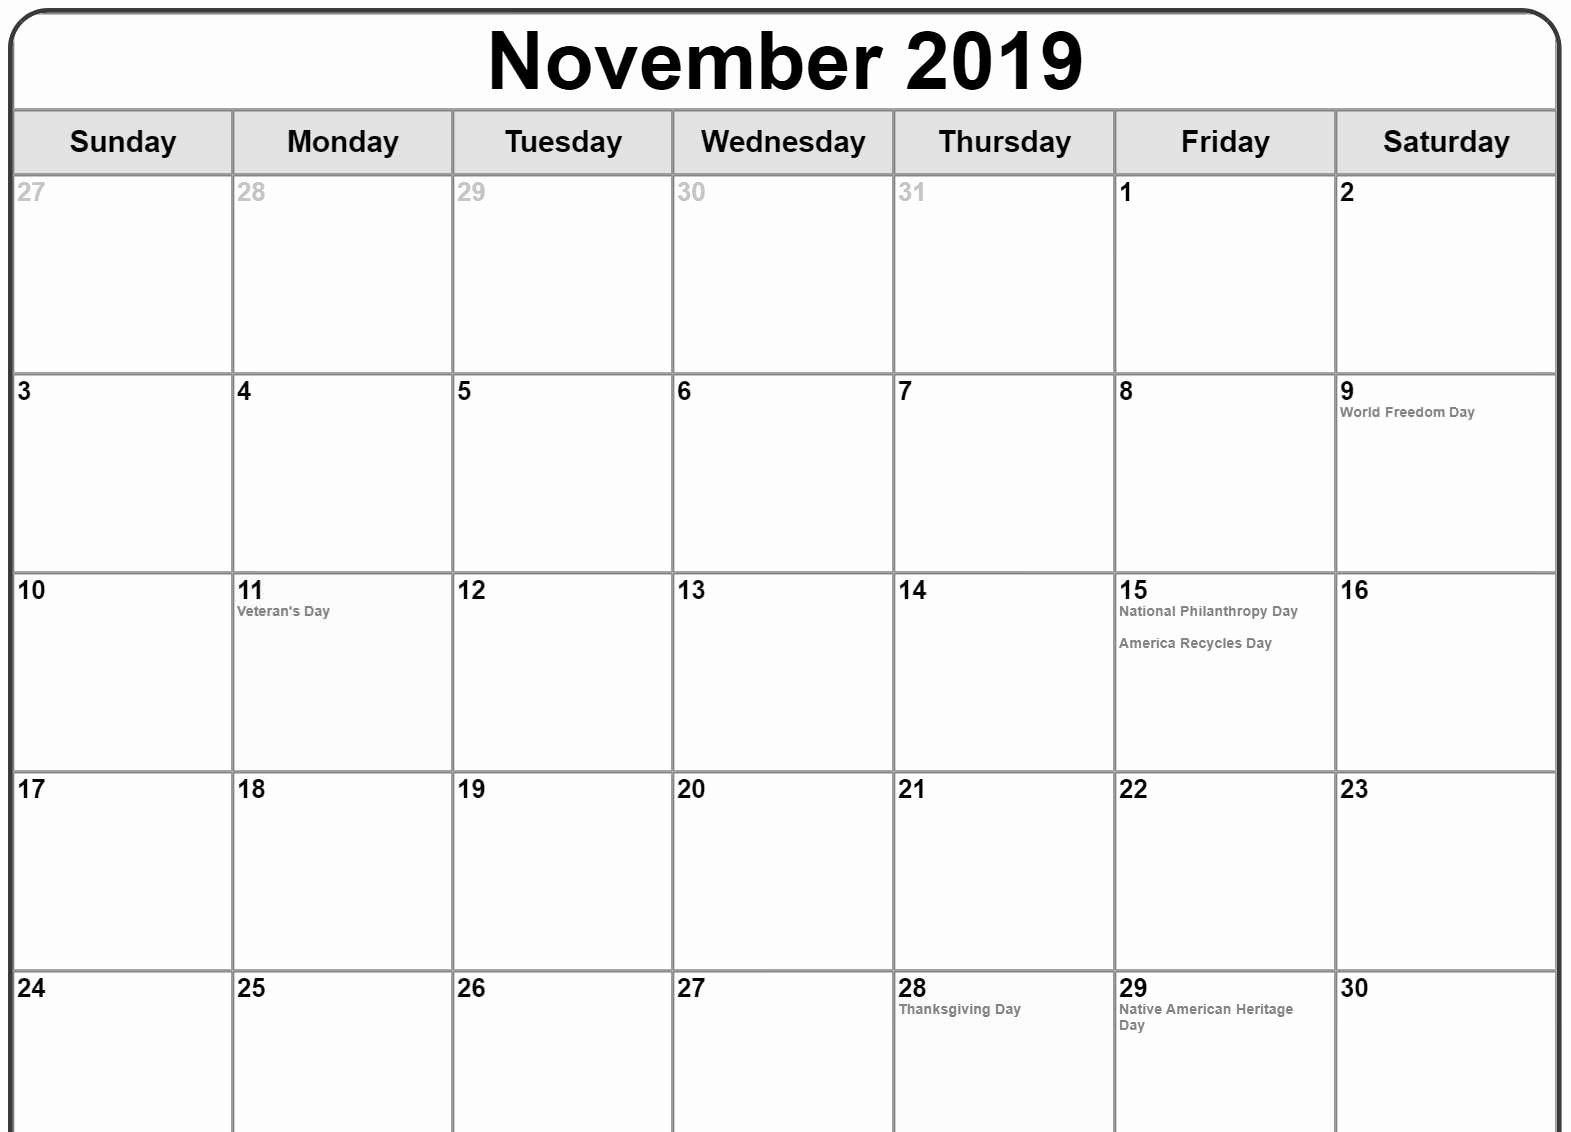 November 2019 Calendar with Holidays UK